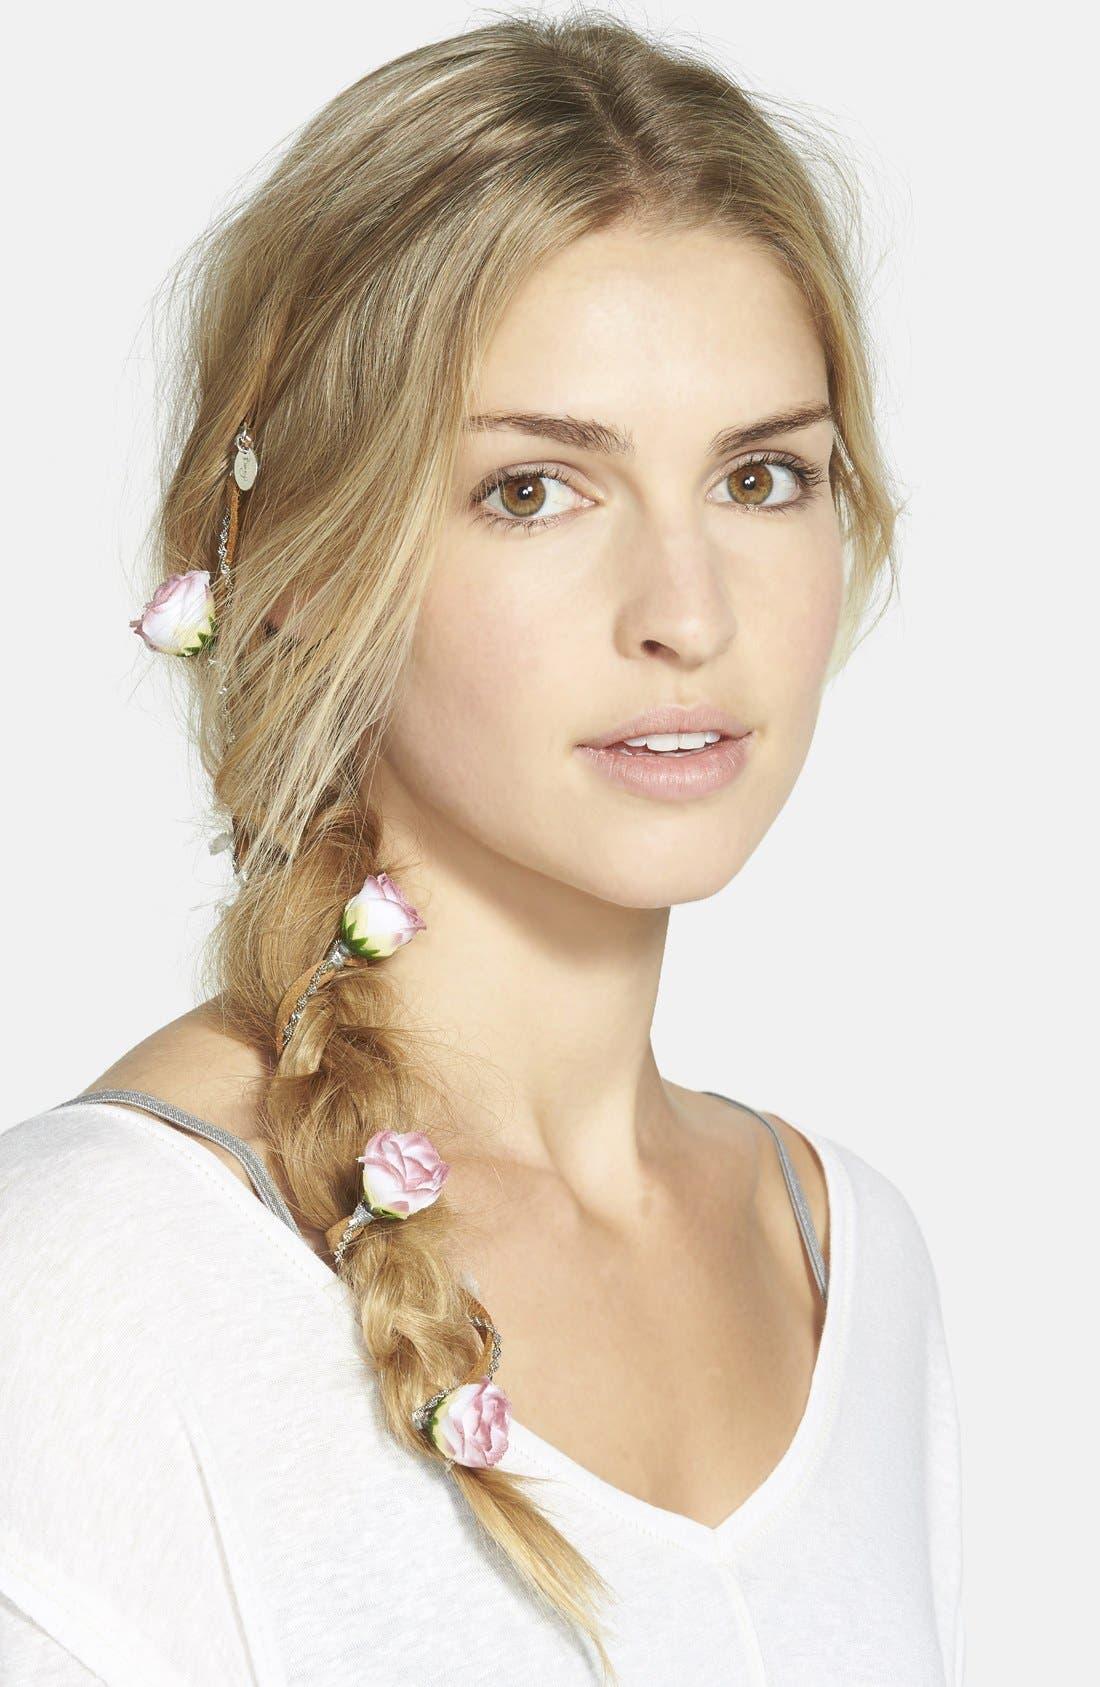 Main Image - Berry 'Rose Chain' Braid-In Hair Clip